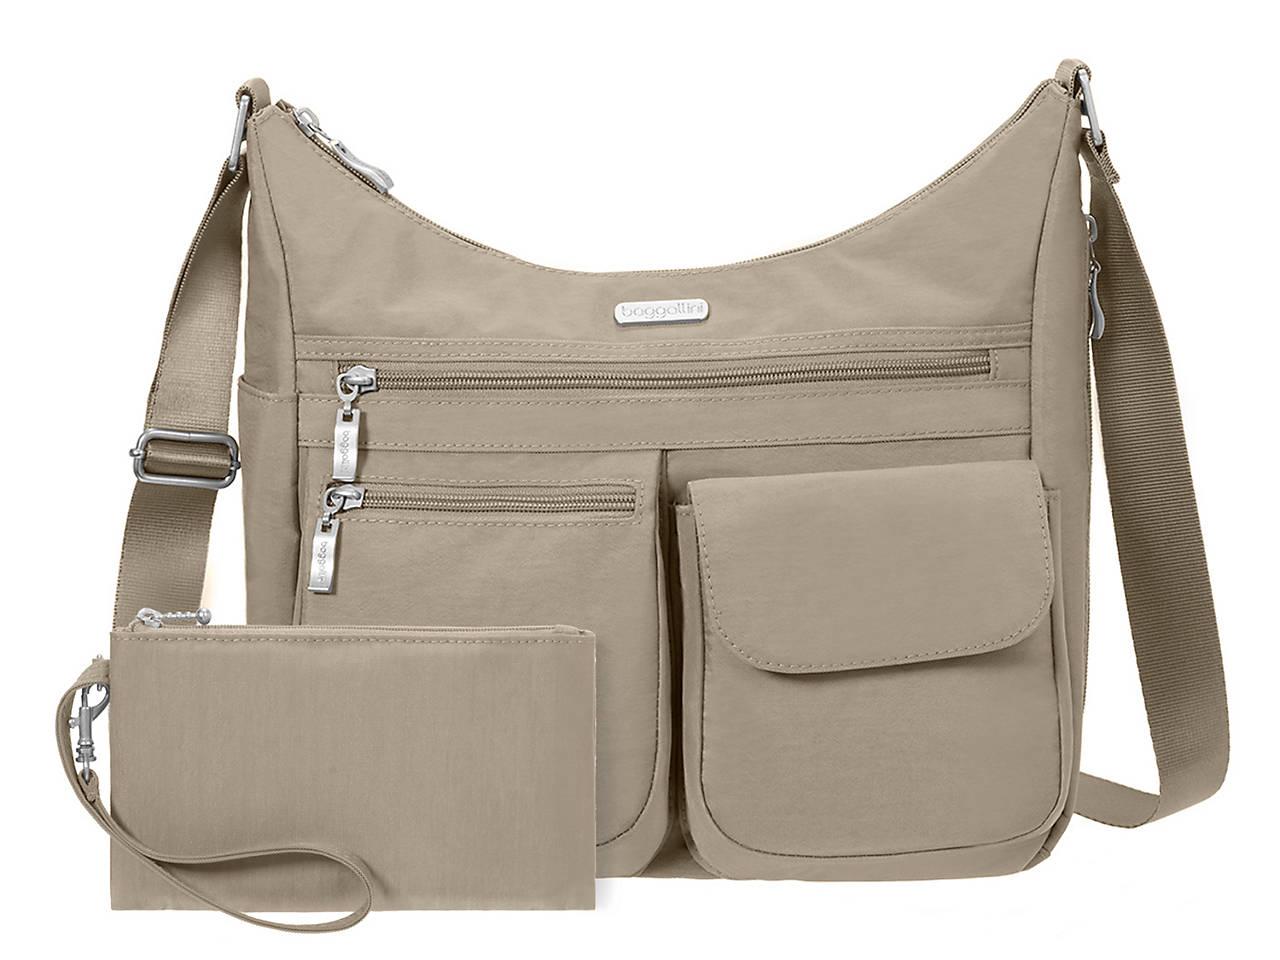 Baggallini Everywhere Crossbody Bag Women s Handbags   Accessories  b2c9e91b36bca